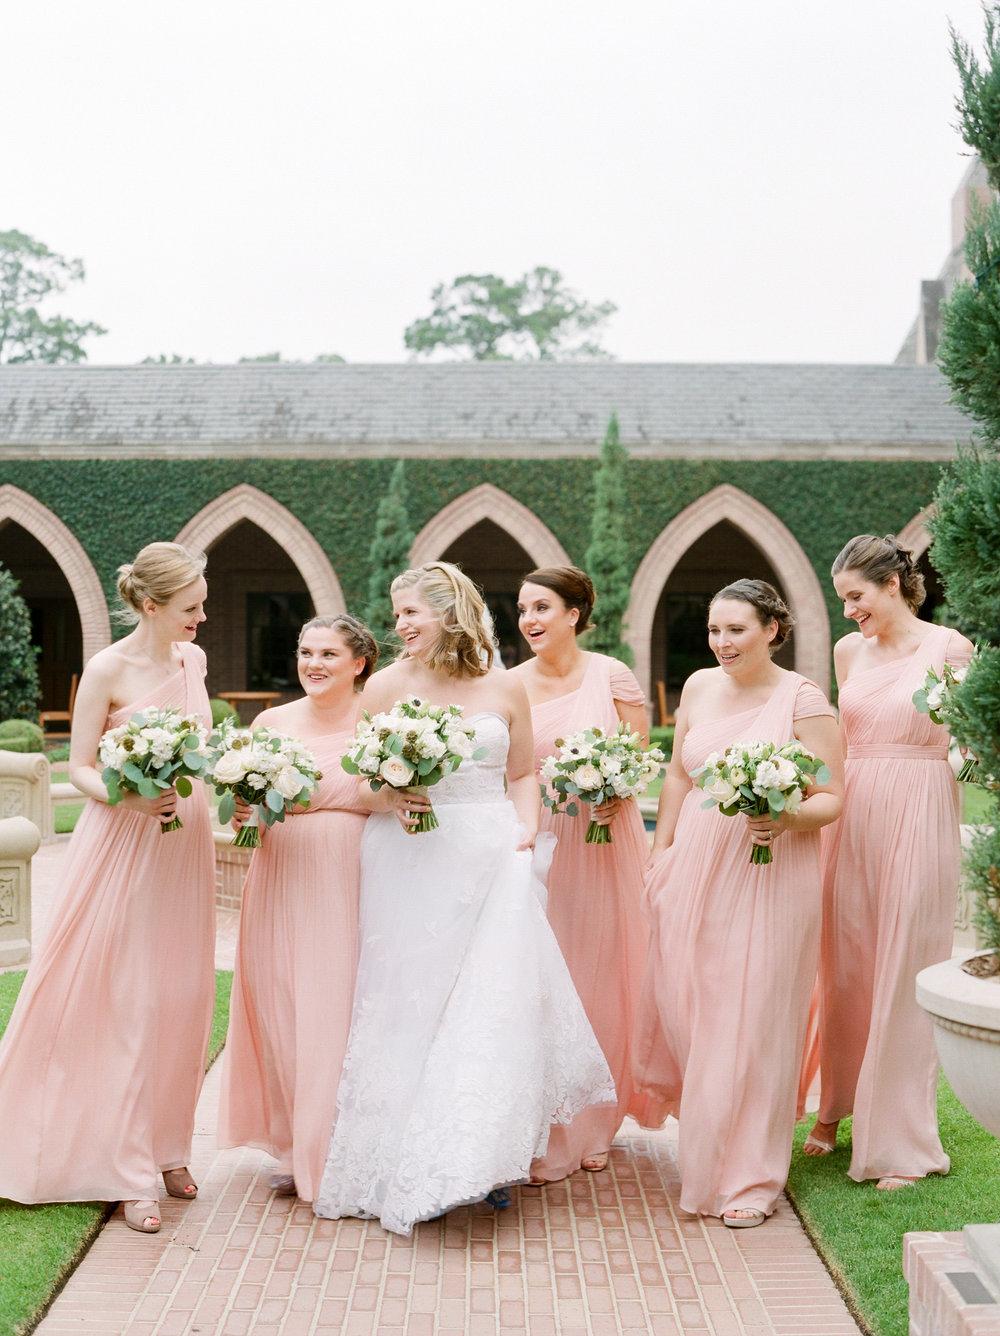 0017_St_Martin_Houston_Wedding_The_Astorian.jpg